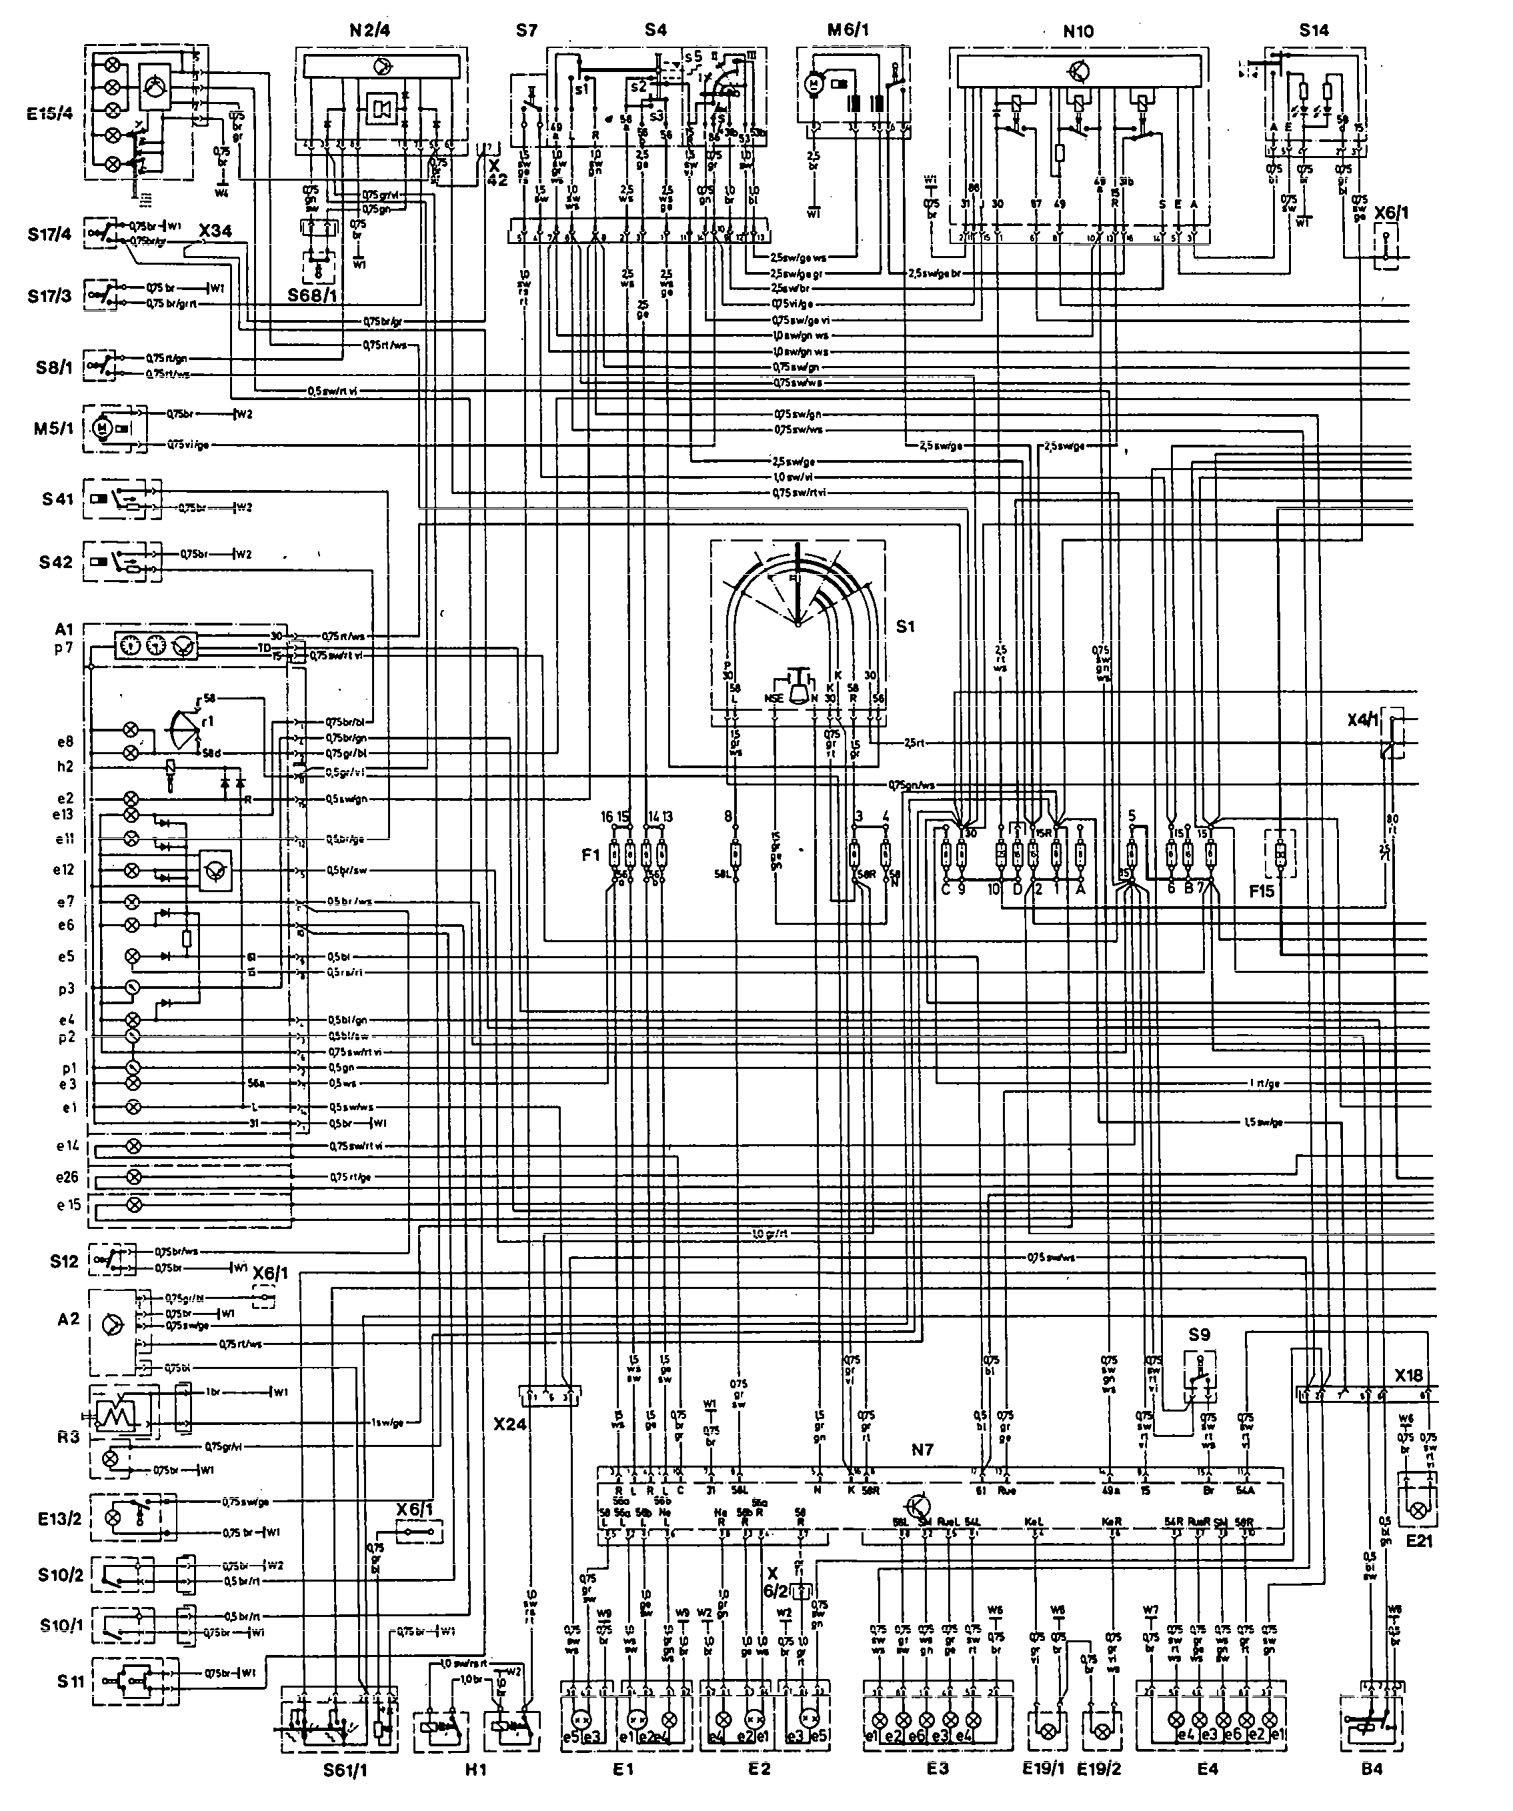 [ZSVE_7041]  Mercedes-Benz 300E (1992 - 1993) - wiring diagrams - starting -  Carknowledge.info | Mercedes Benz 300e Engine Diagram |  | Carknowledge.info